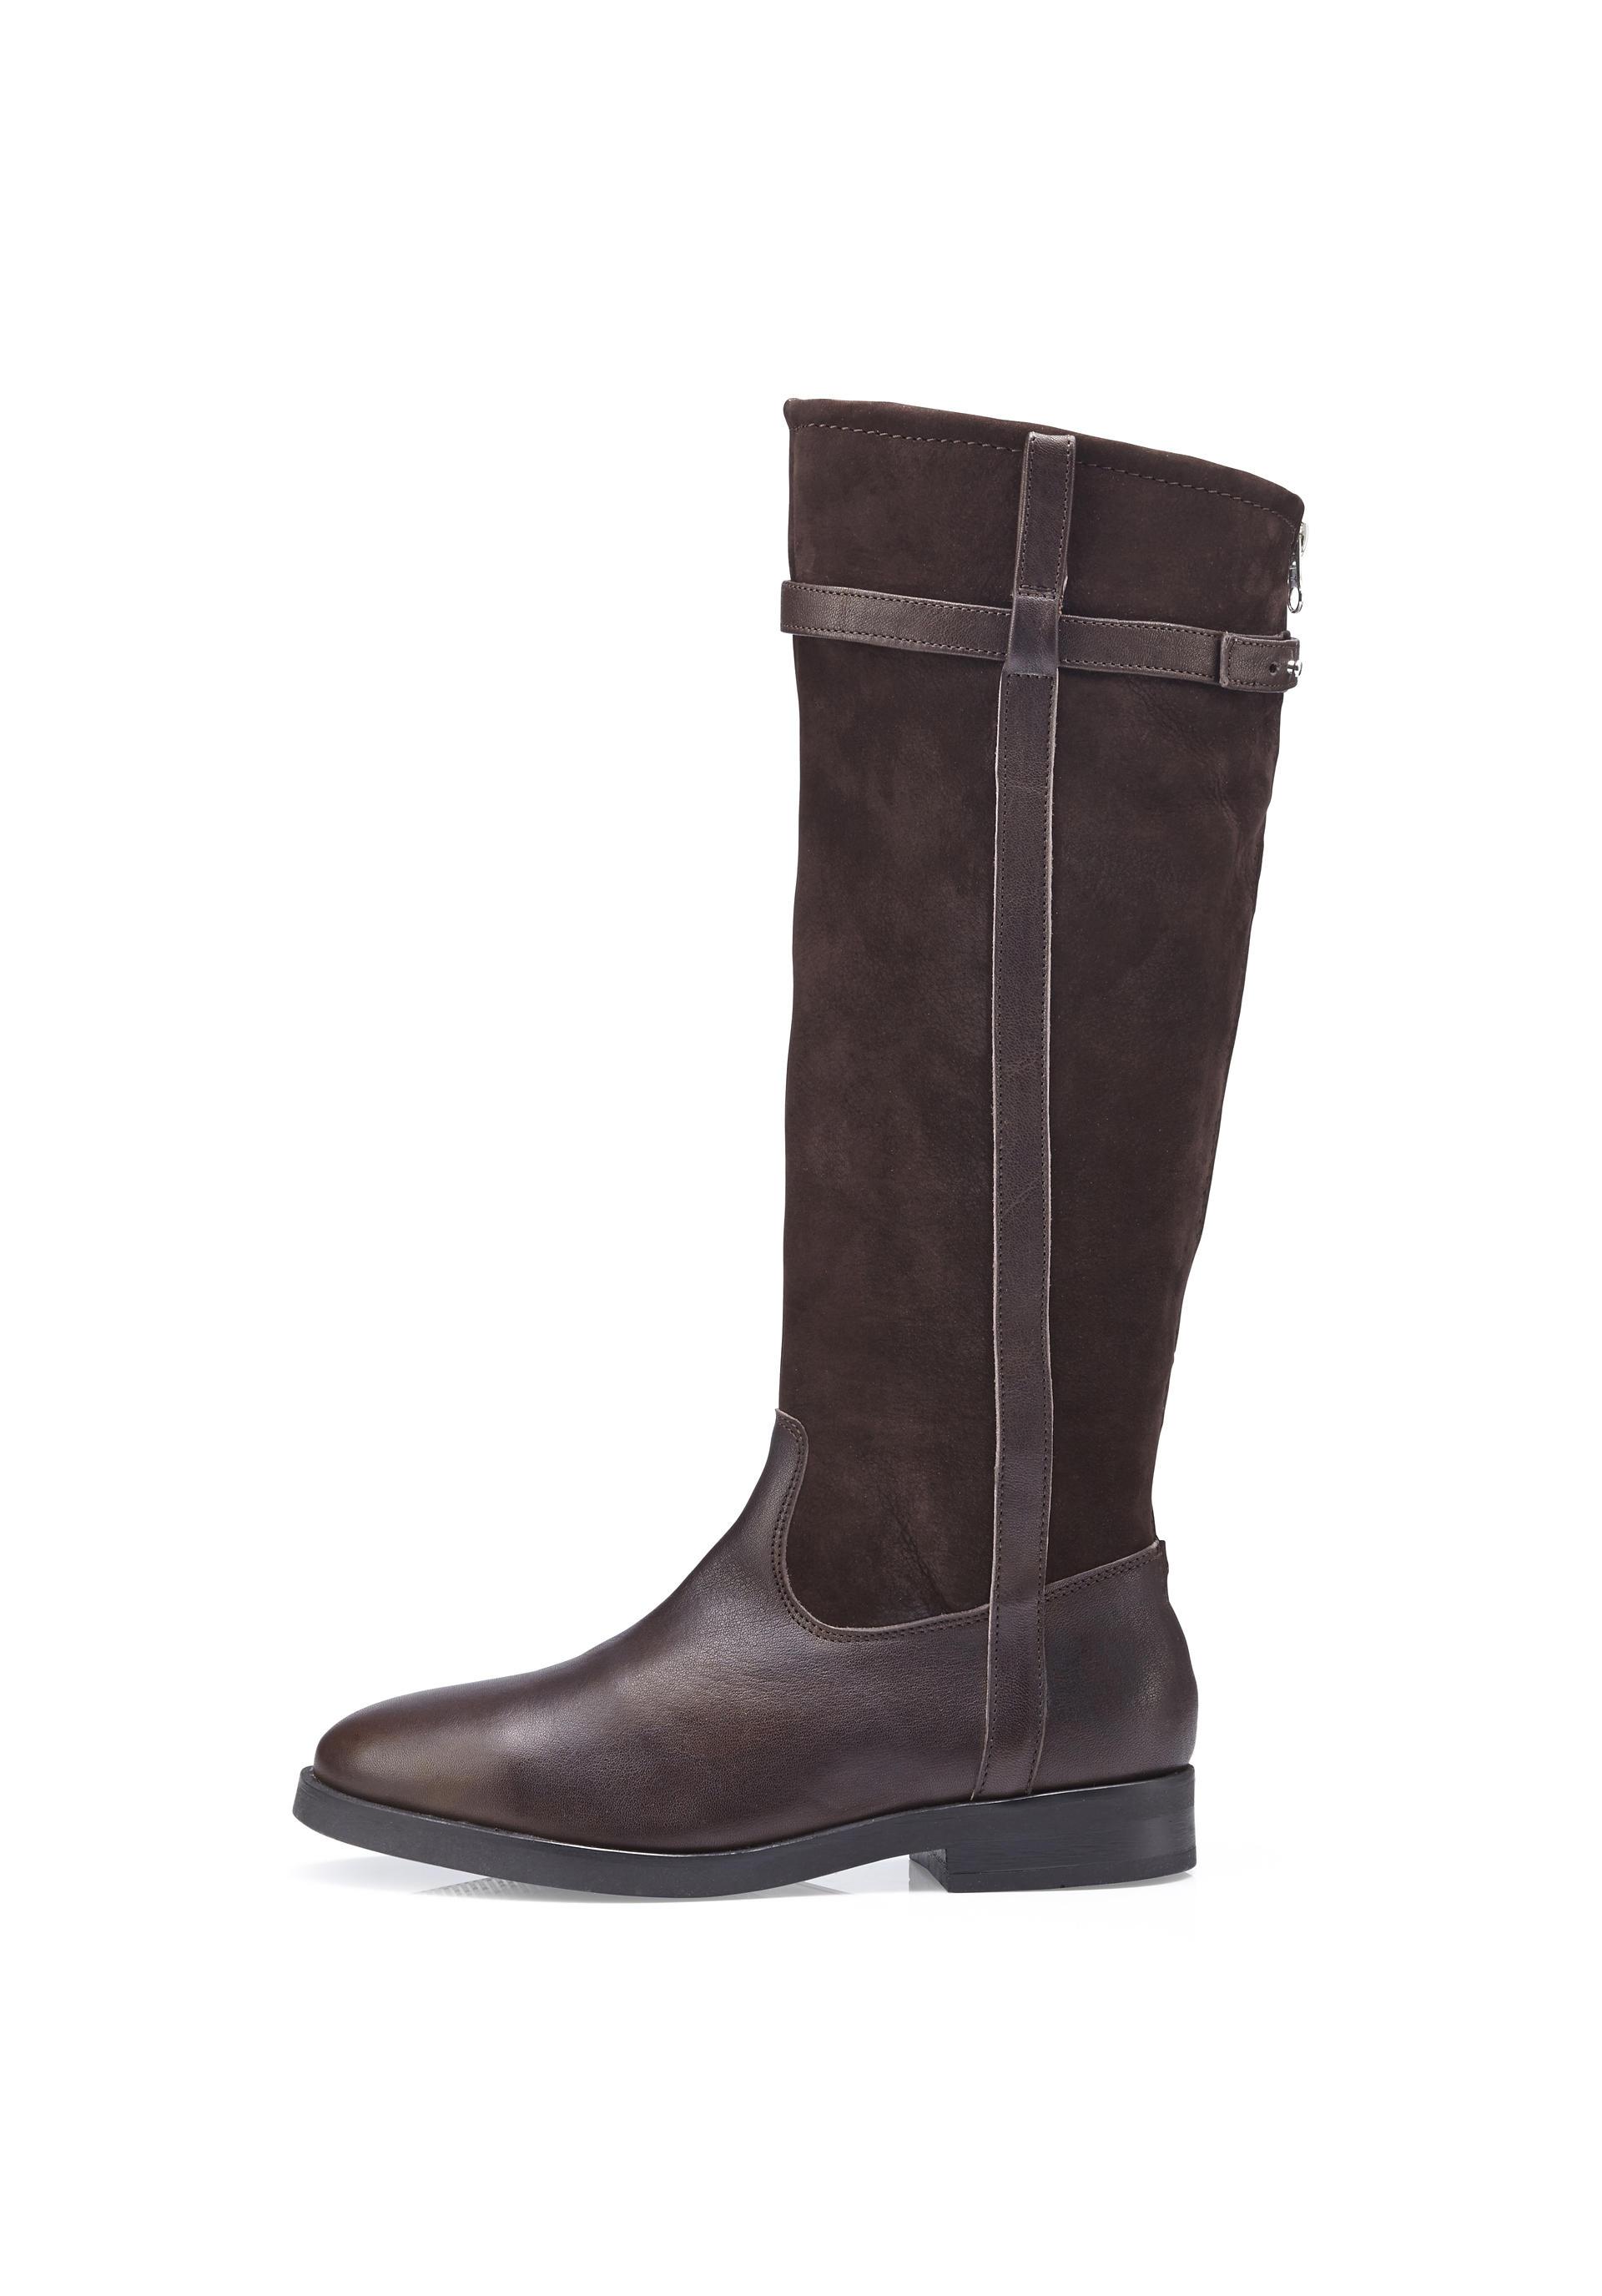 best authentic f9056 73d09 Damen Stiefel aus Leder von hessnatur